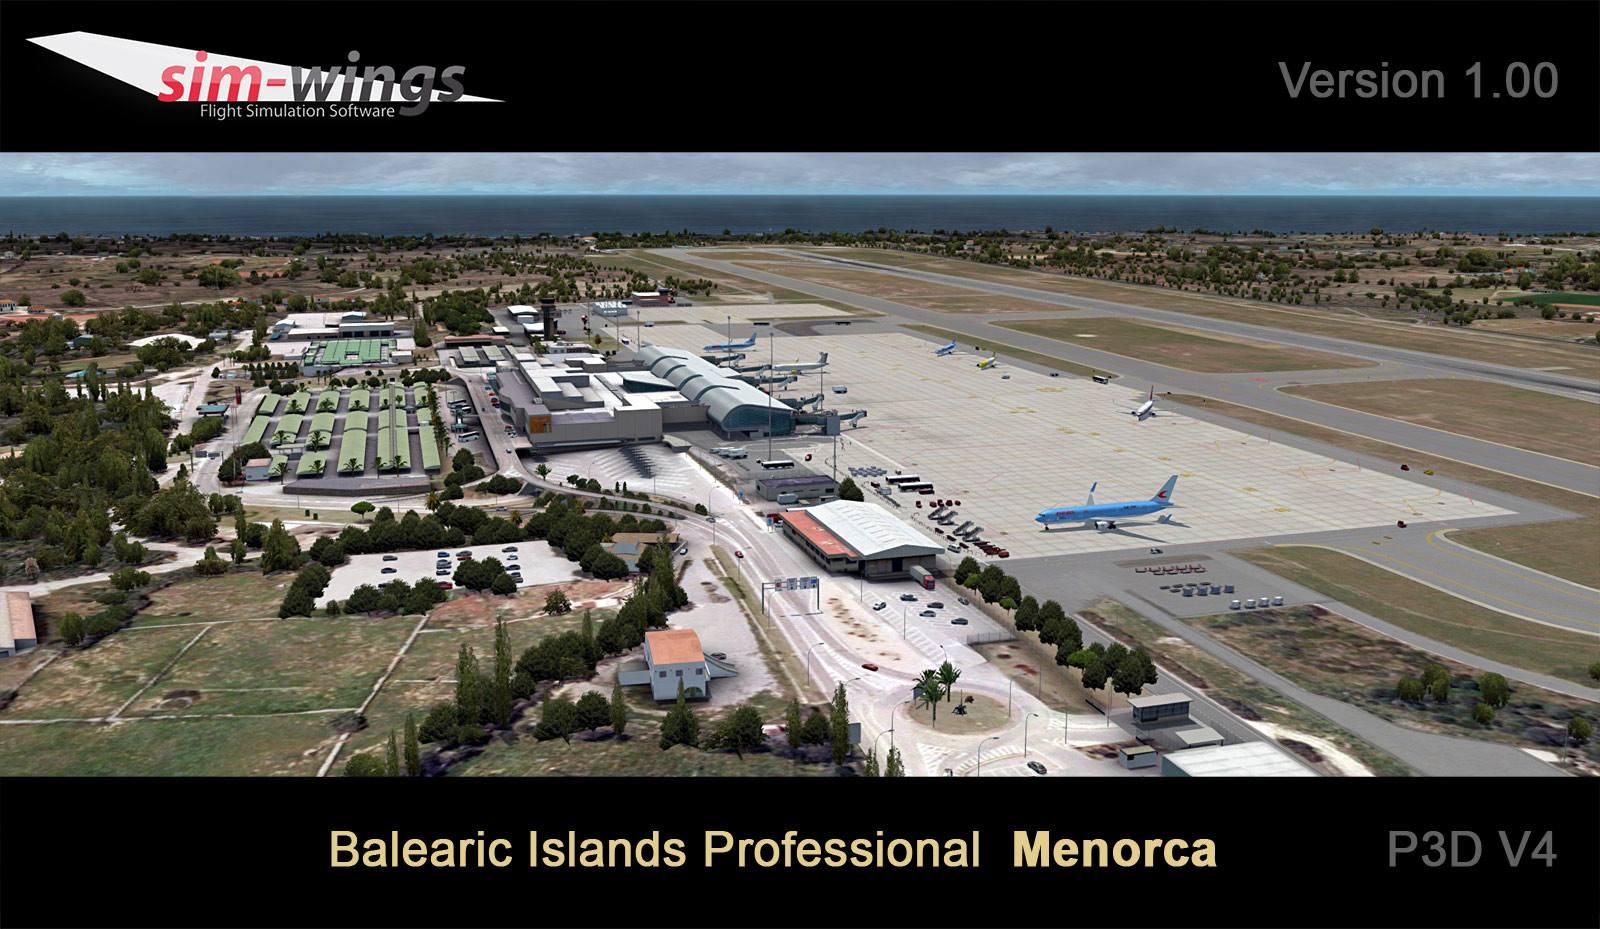 198485 Balearic Islands Professional Menorca P3Dv4 02